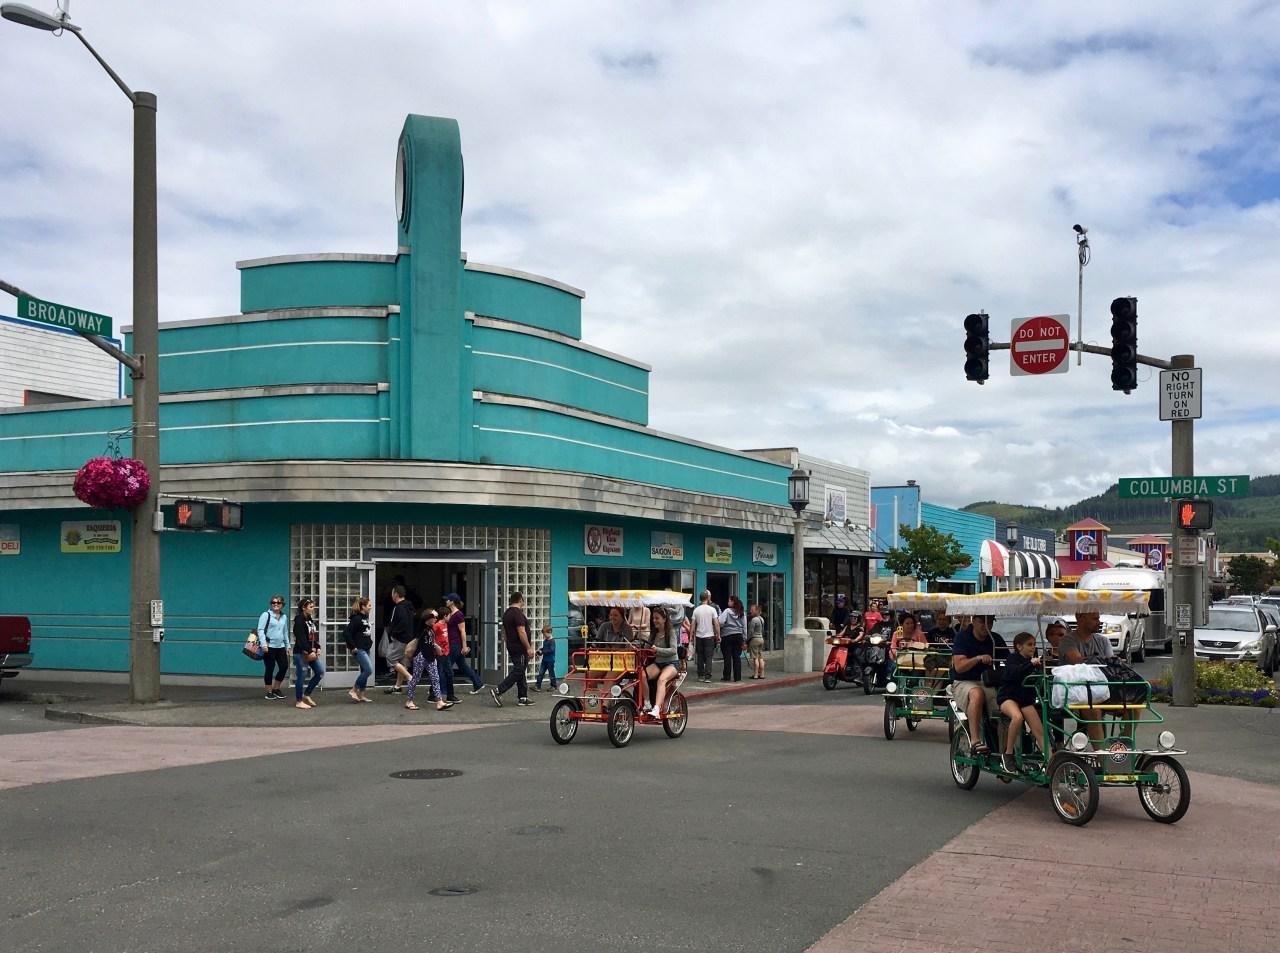 Broadway and Columbia at Seaside, Oregon